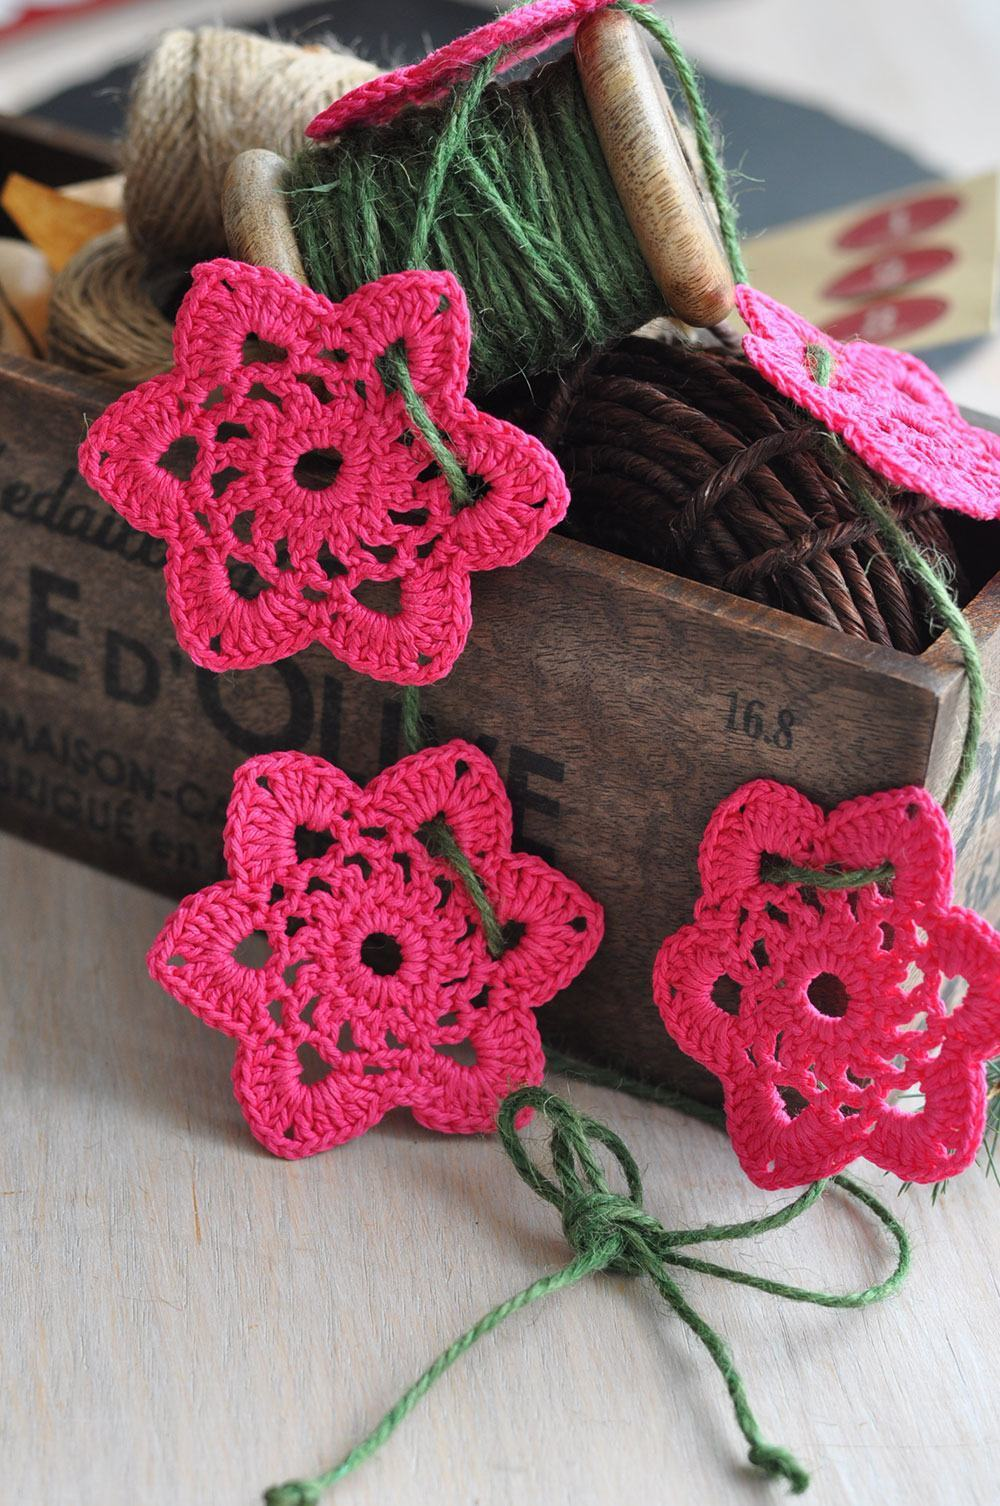 Flores de crochê unidas por barbantes